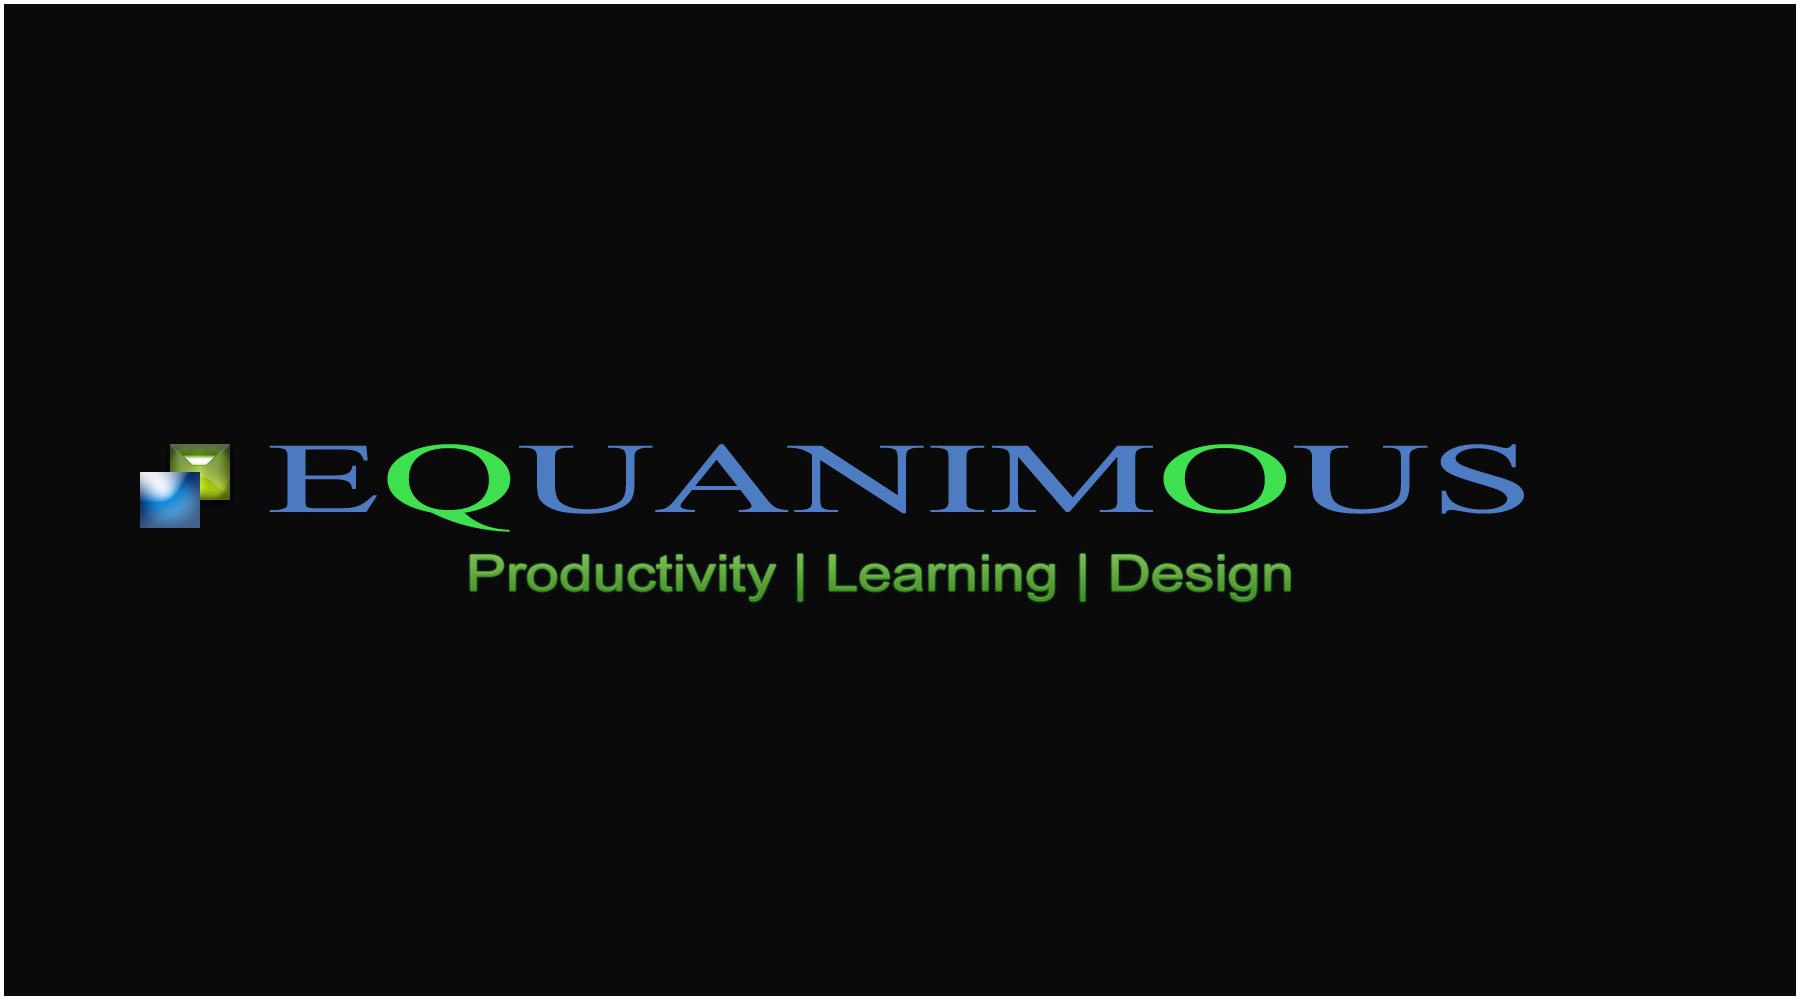 Logo Design by DOUMA AMINE - Entry No. 485 in the Logo Design Contest Logo Design : EQUANIMOUS : Productivity | Learning | Design.